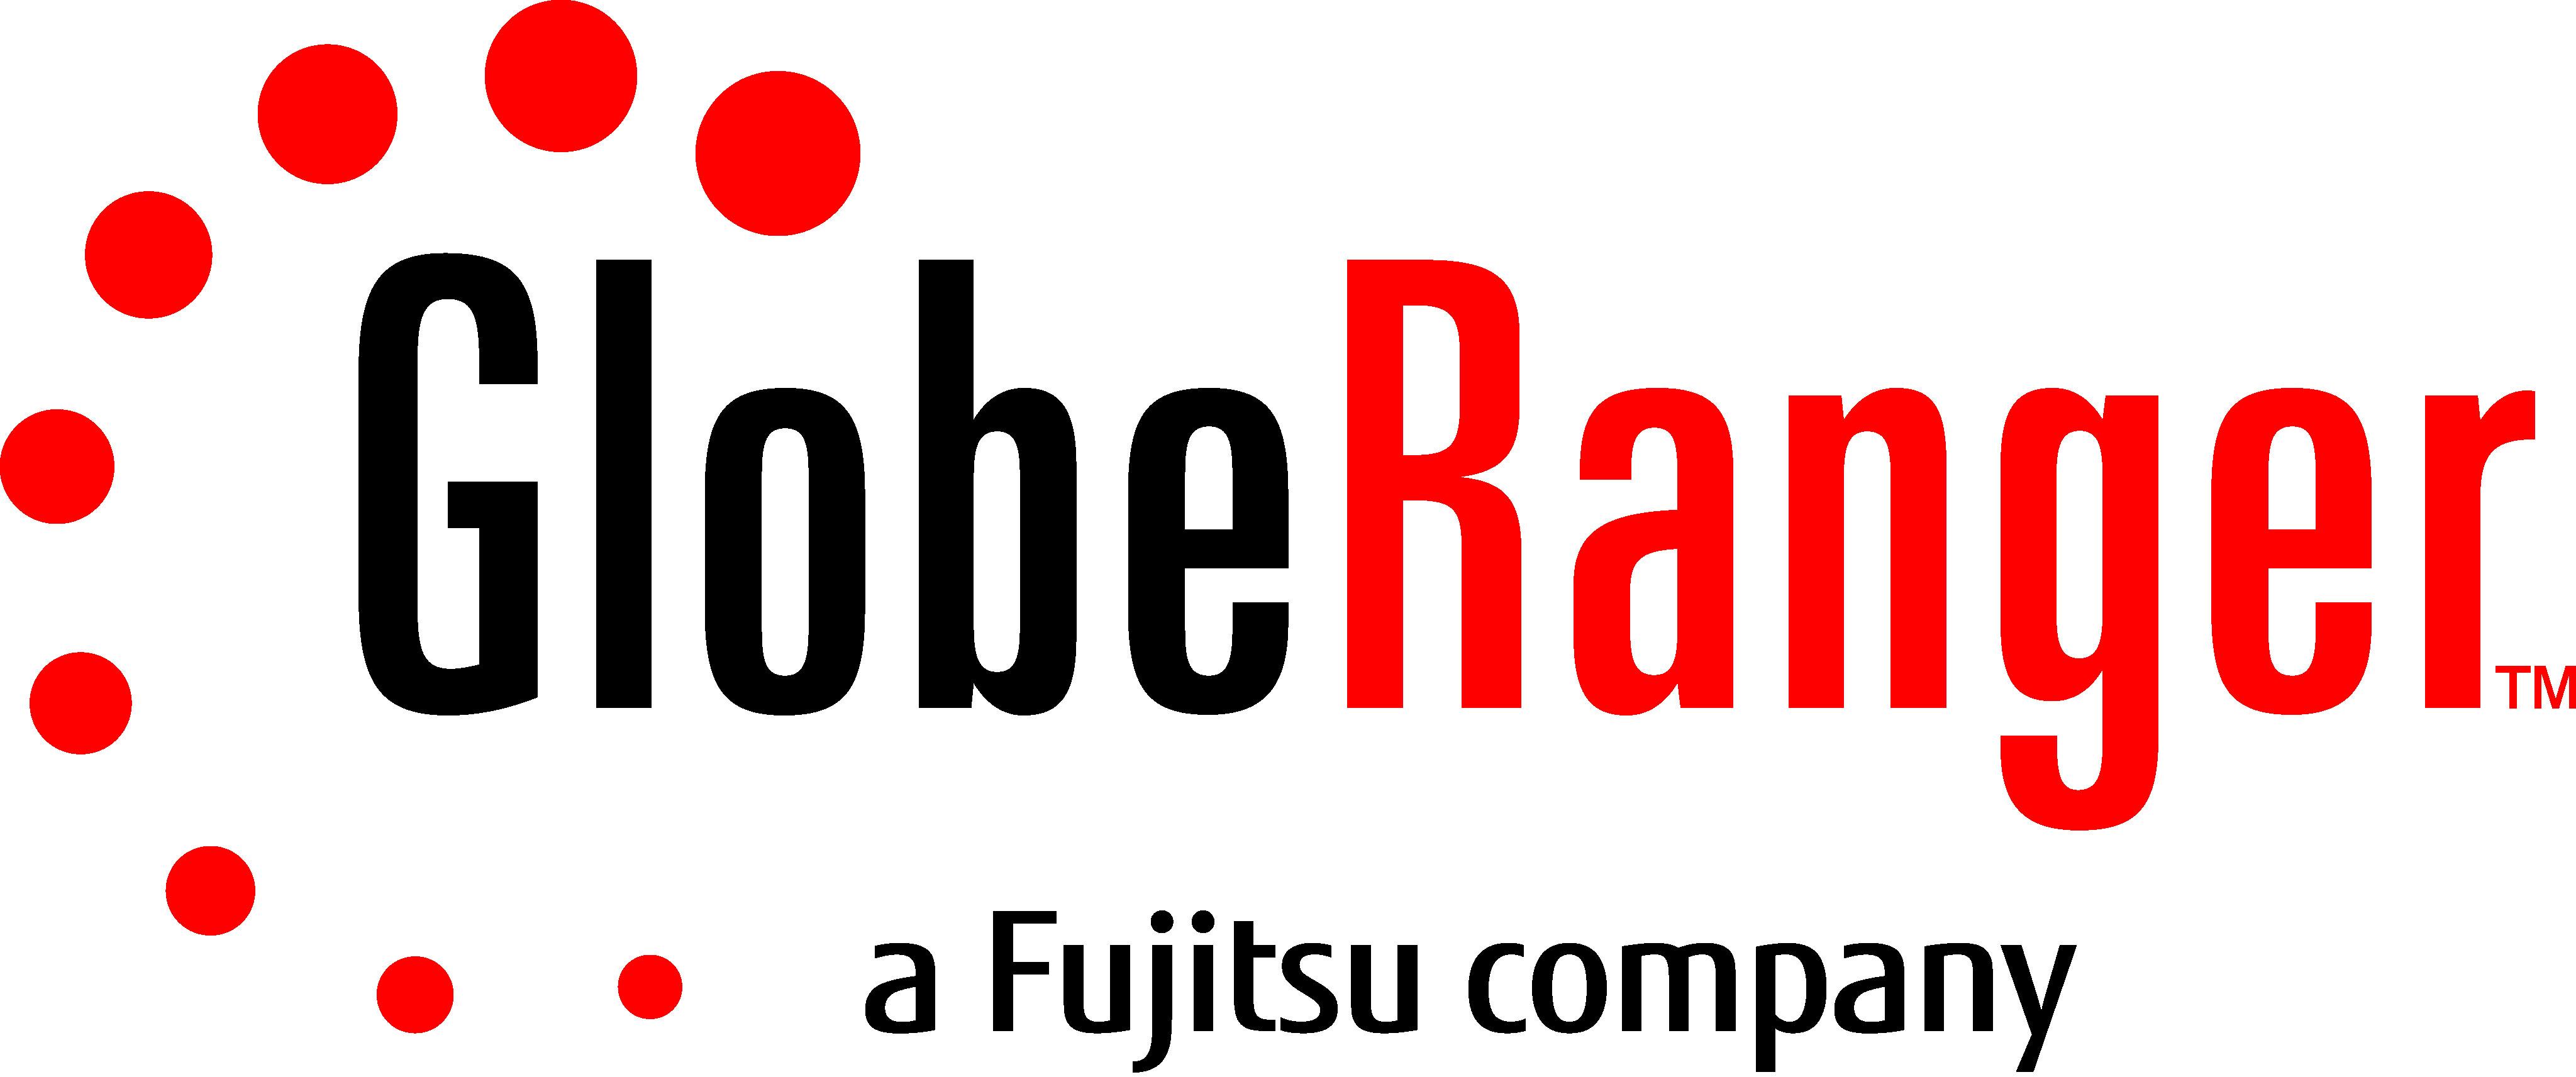 GlobeRanger_Fujitsu_Logo_2016.jpg